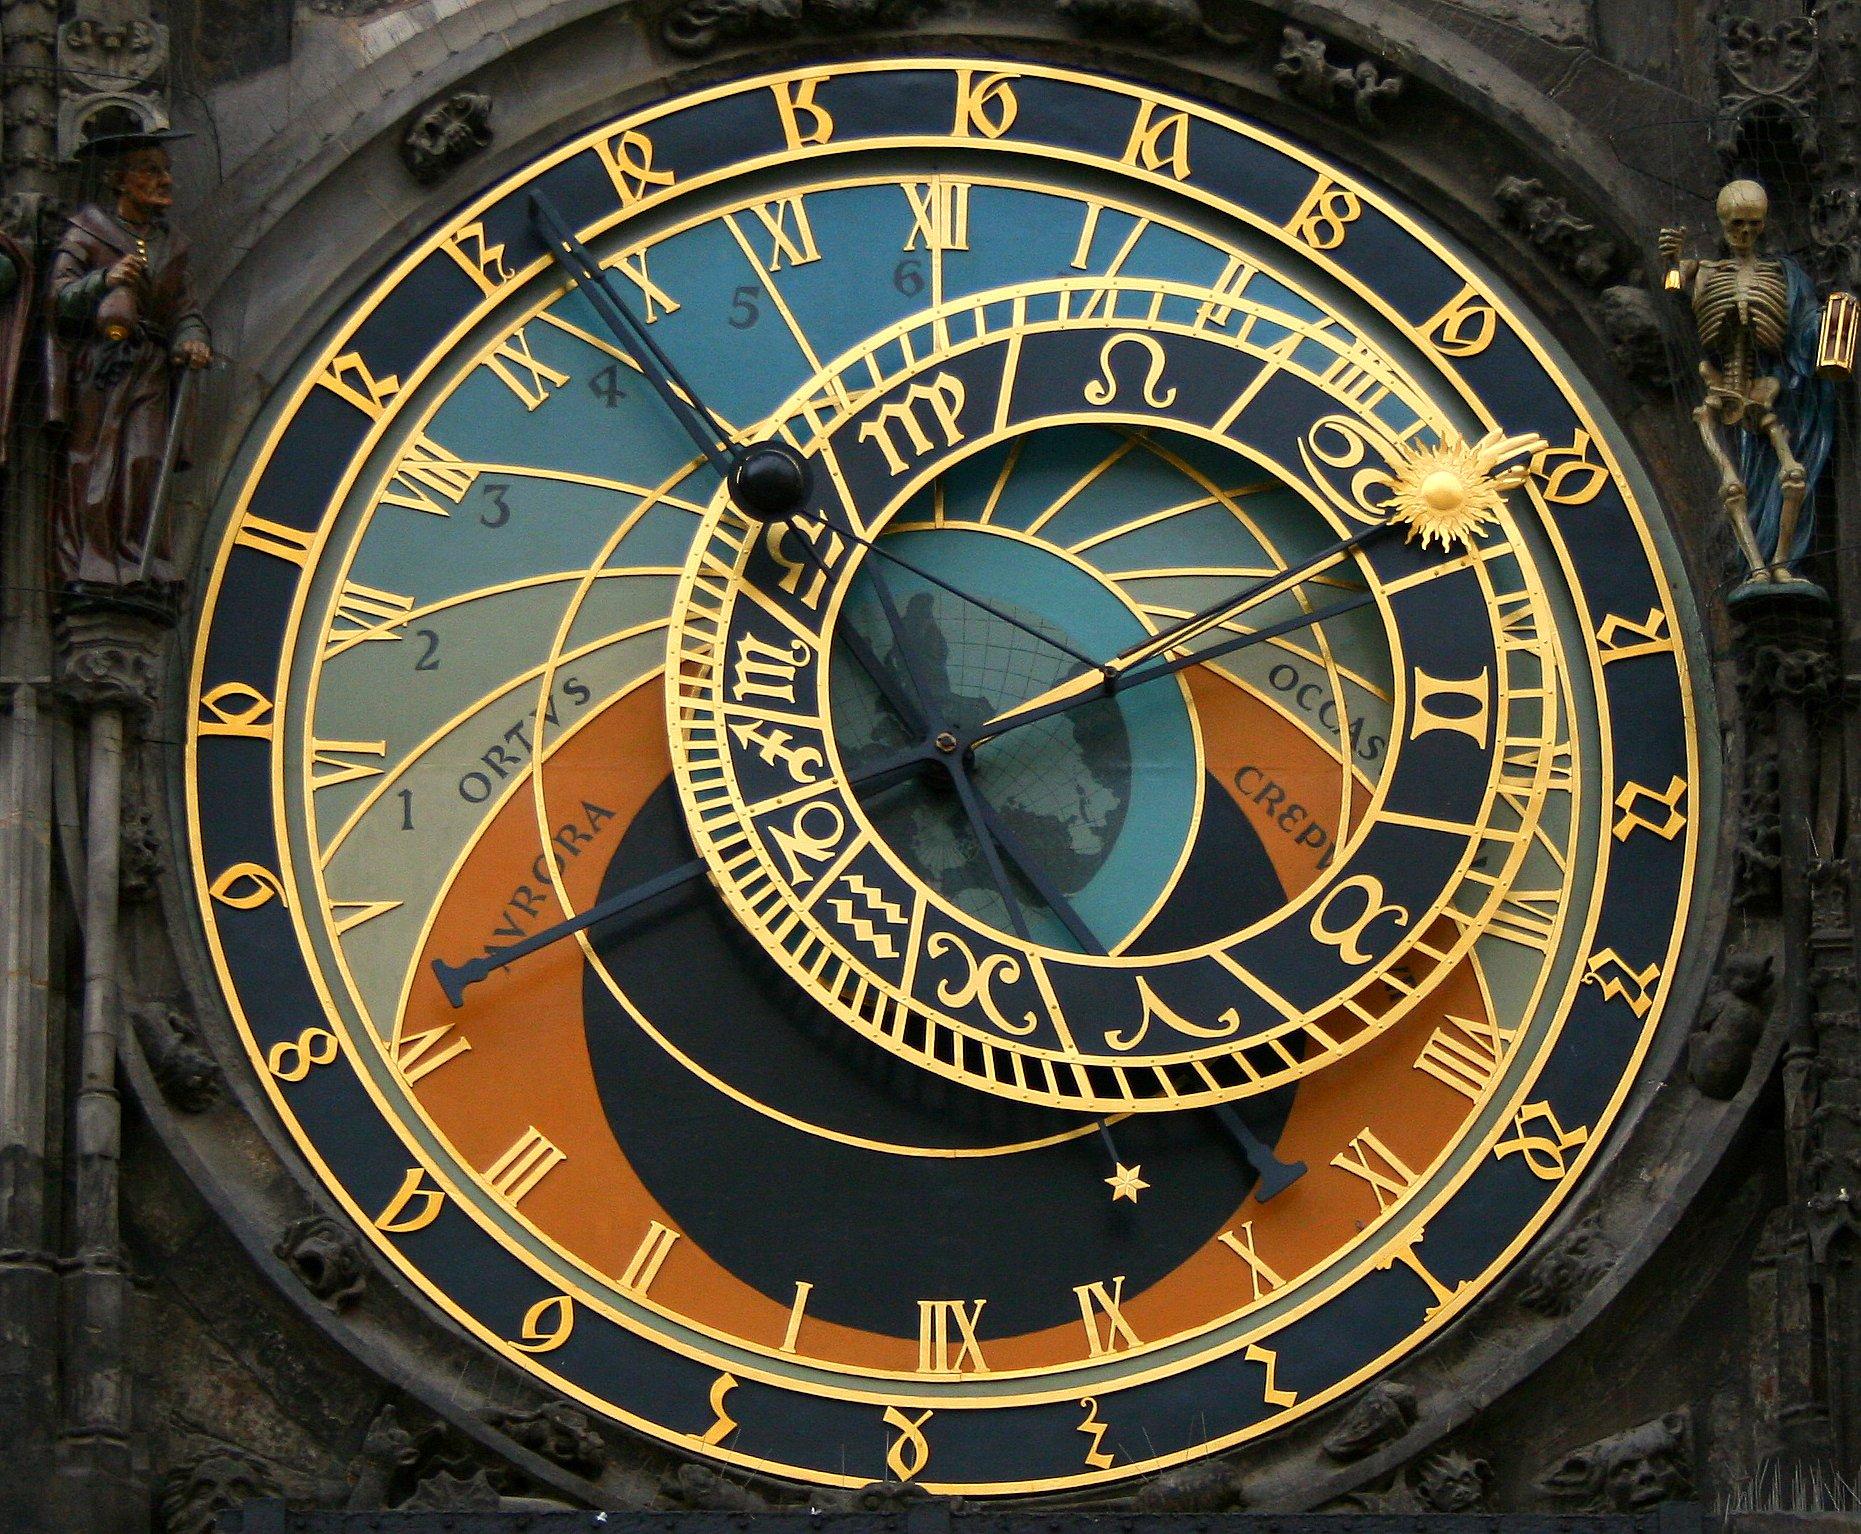 Saint Seiya 3d Live Wallpaper 파일 Astronomical Clock Prague Jpg 위키백과 우리 모두의 백과사전